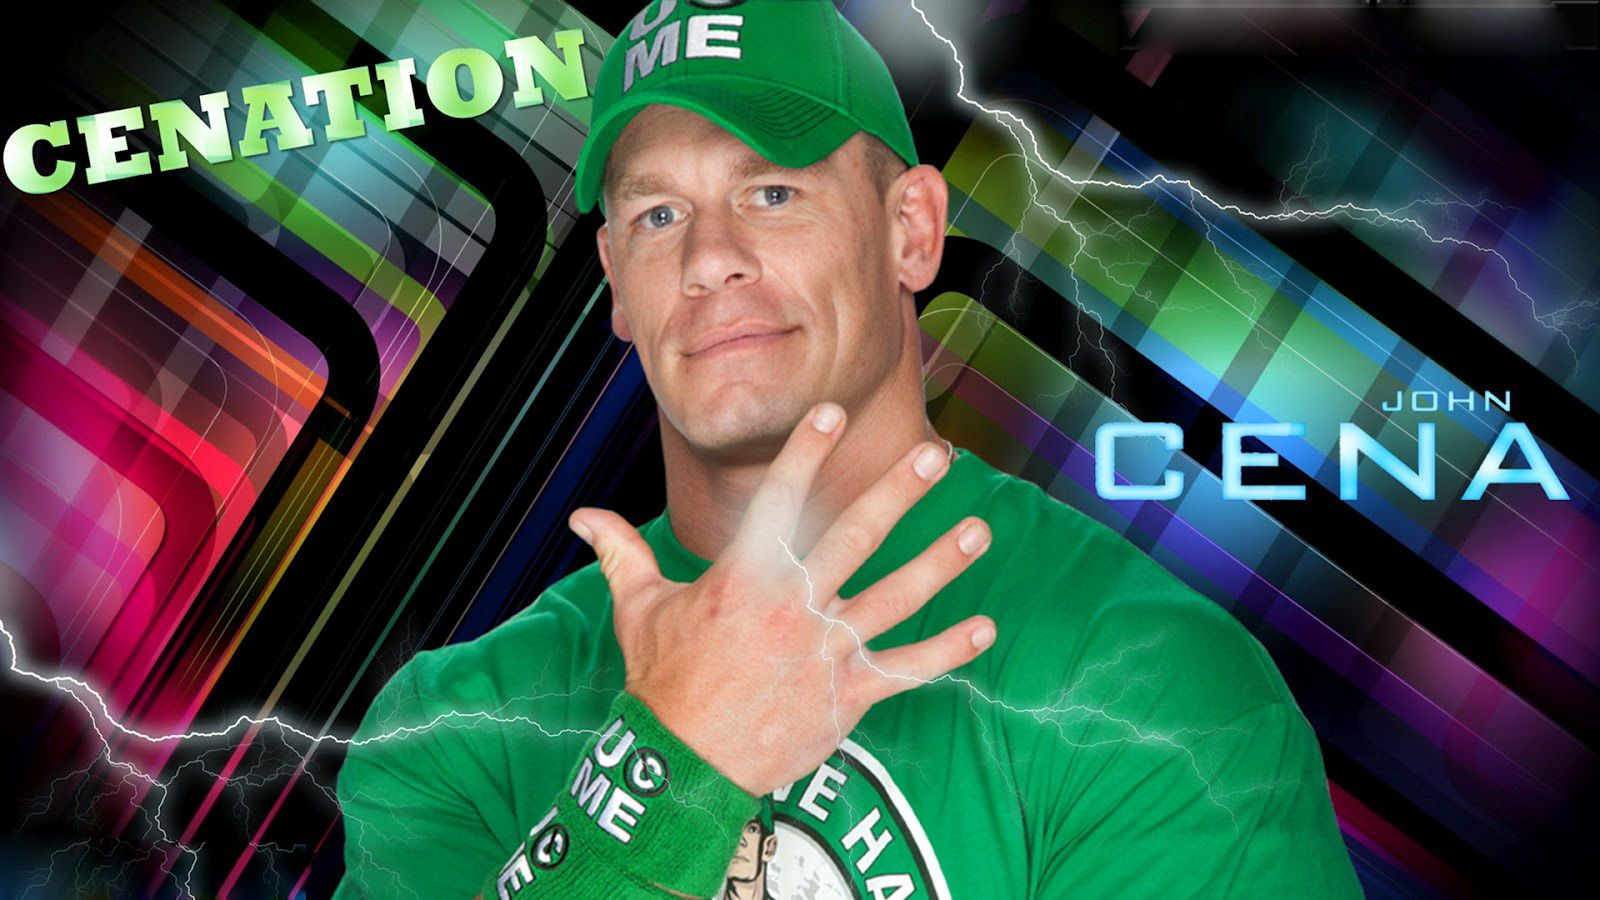 John cena - John Cena Sports Players Wwe John Cena Wallpapers Hd 2012